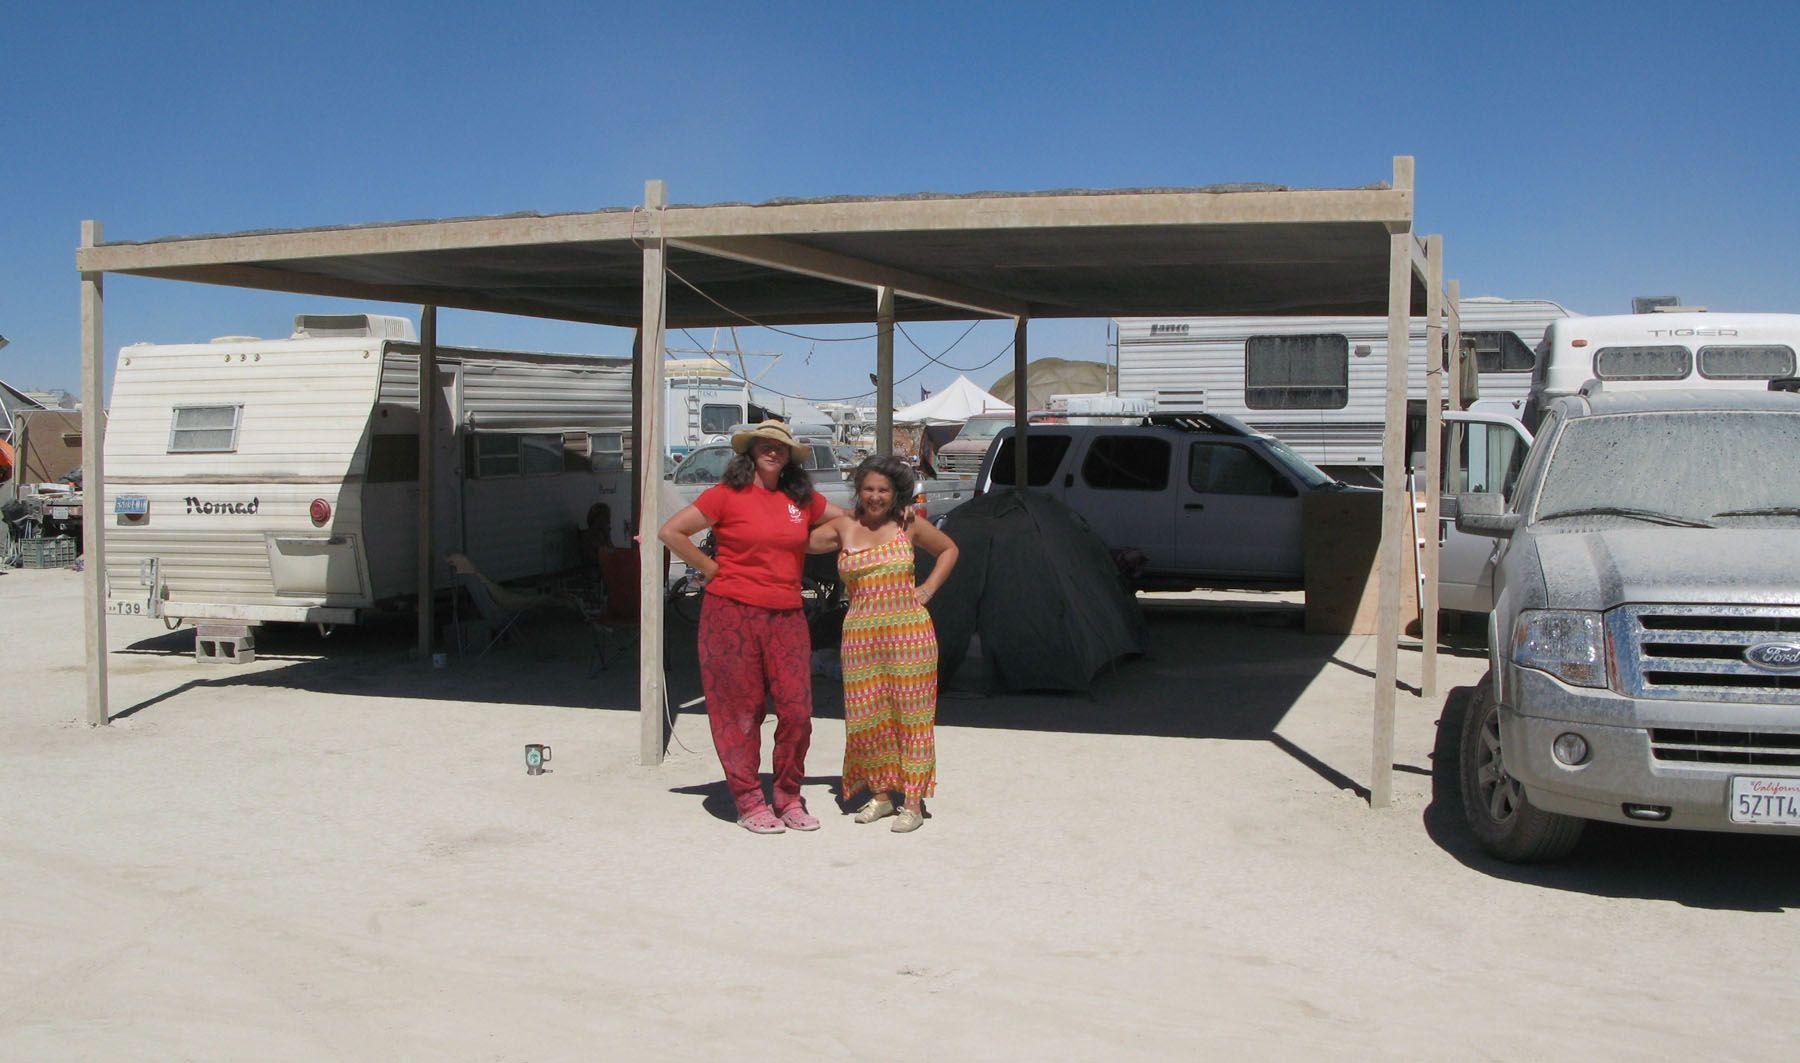 Lightweight 2x4 shade structure at burning man. Carport